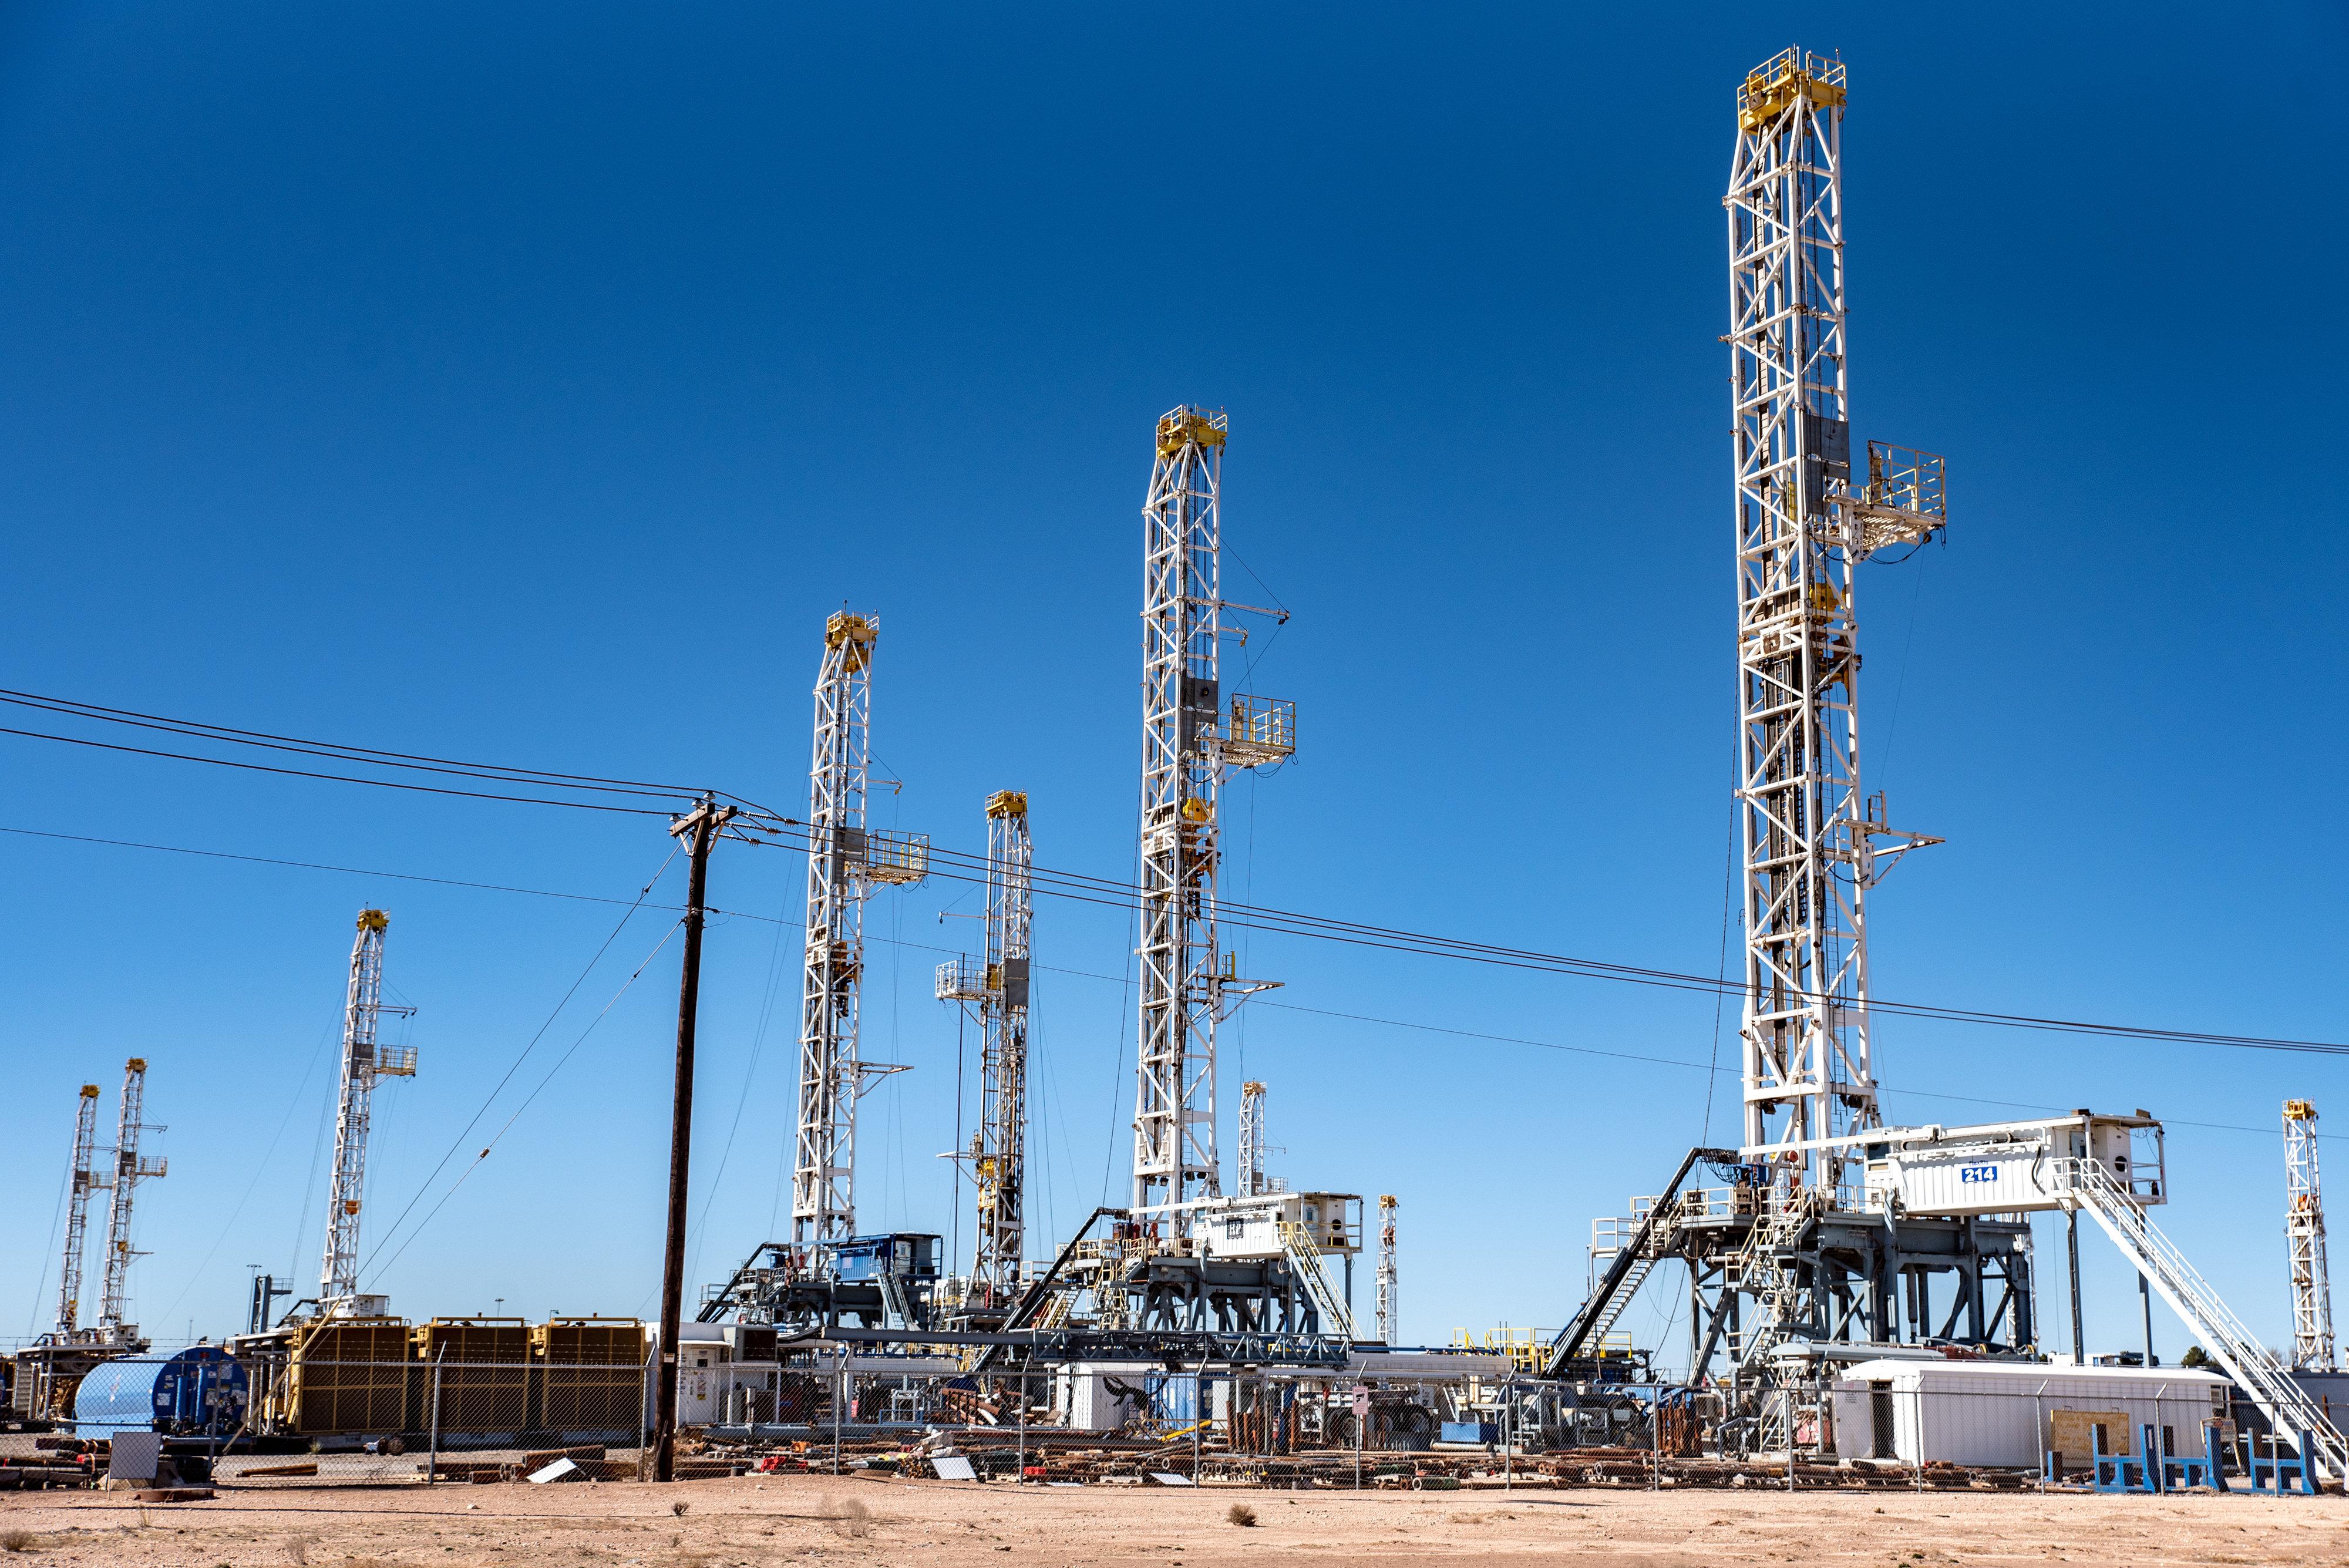 huffpost.com - Alexander C. Kaufman - Oil Giants Invest $110 Billion In New Fossil Fuels After Spending $1 Billion On Green PR